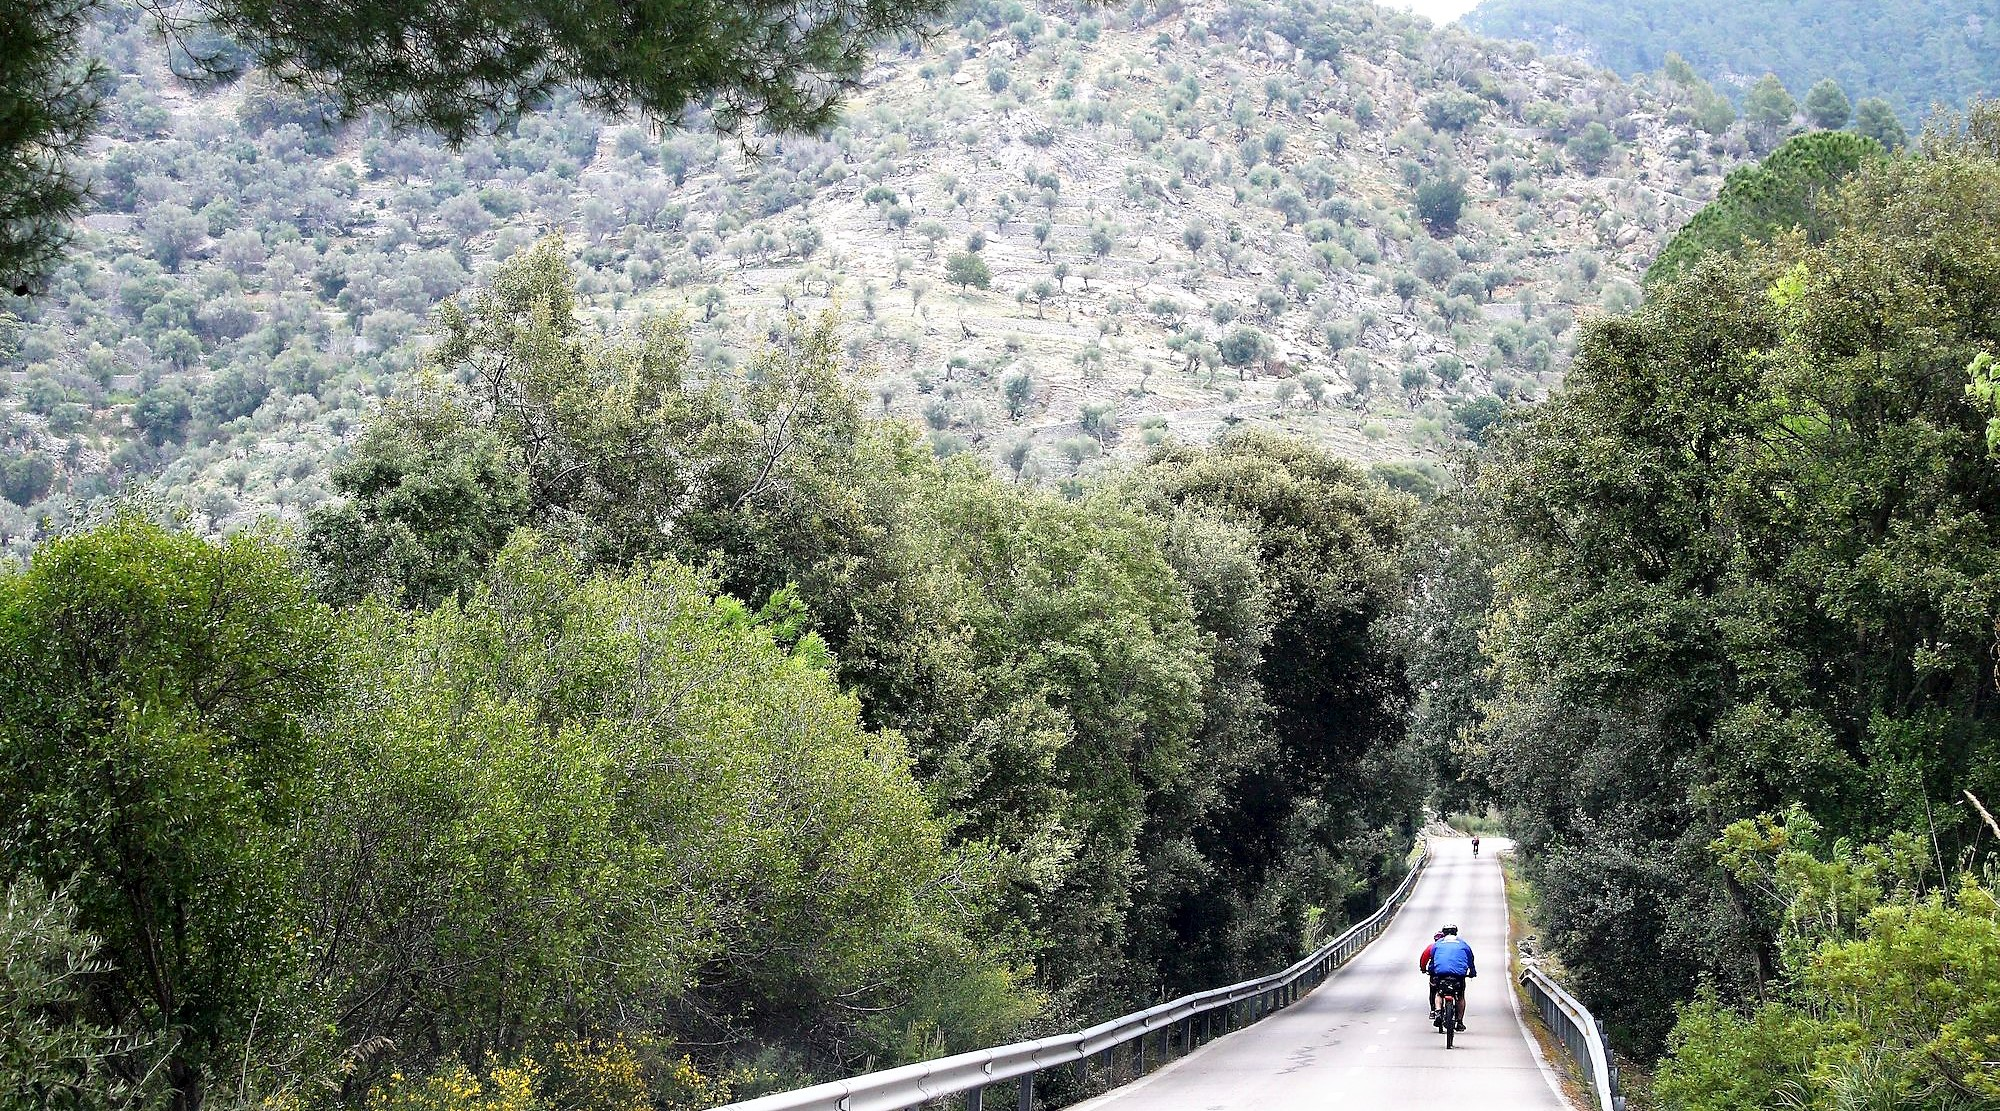 Serra de Tramuntana en bicicleta. Alaro 2. BICIS EN RUTA. 1170x650